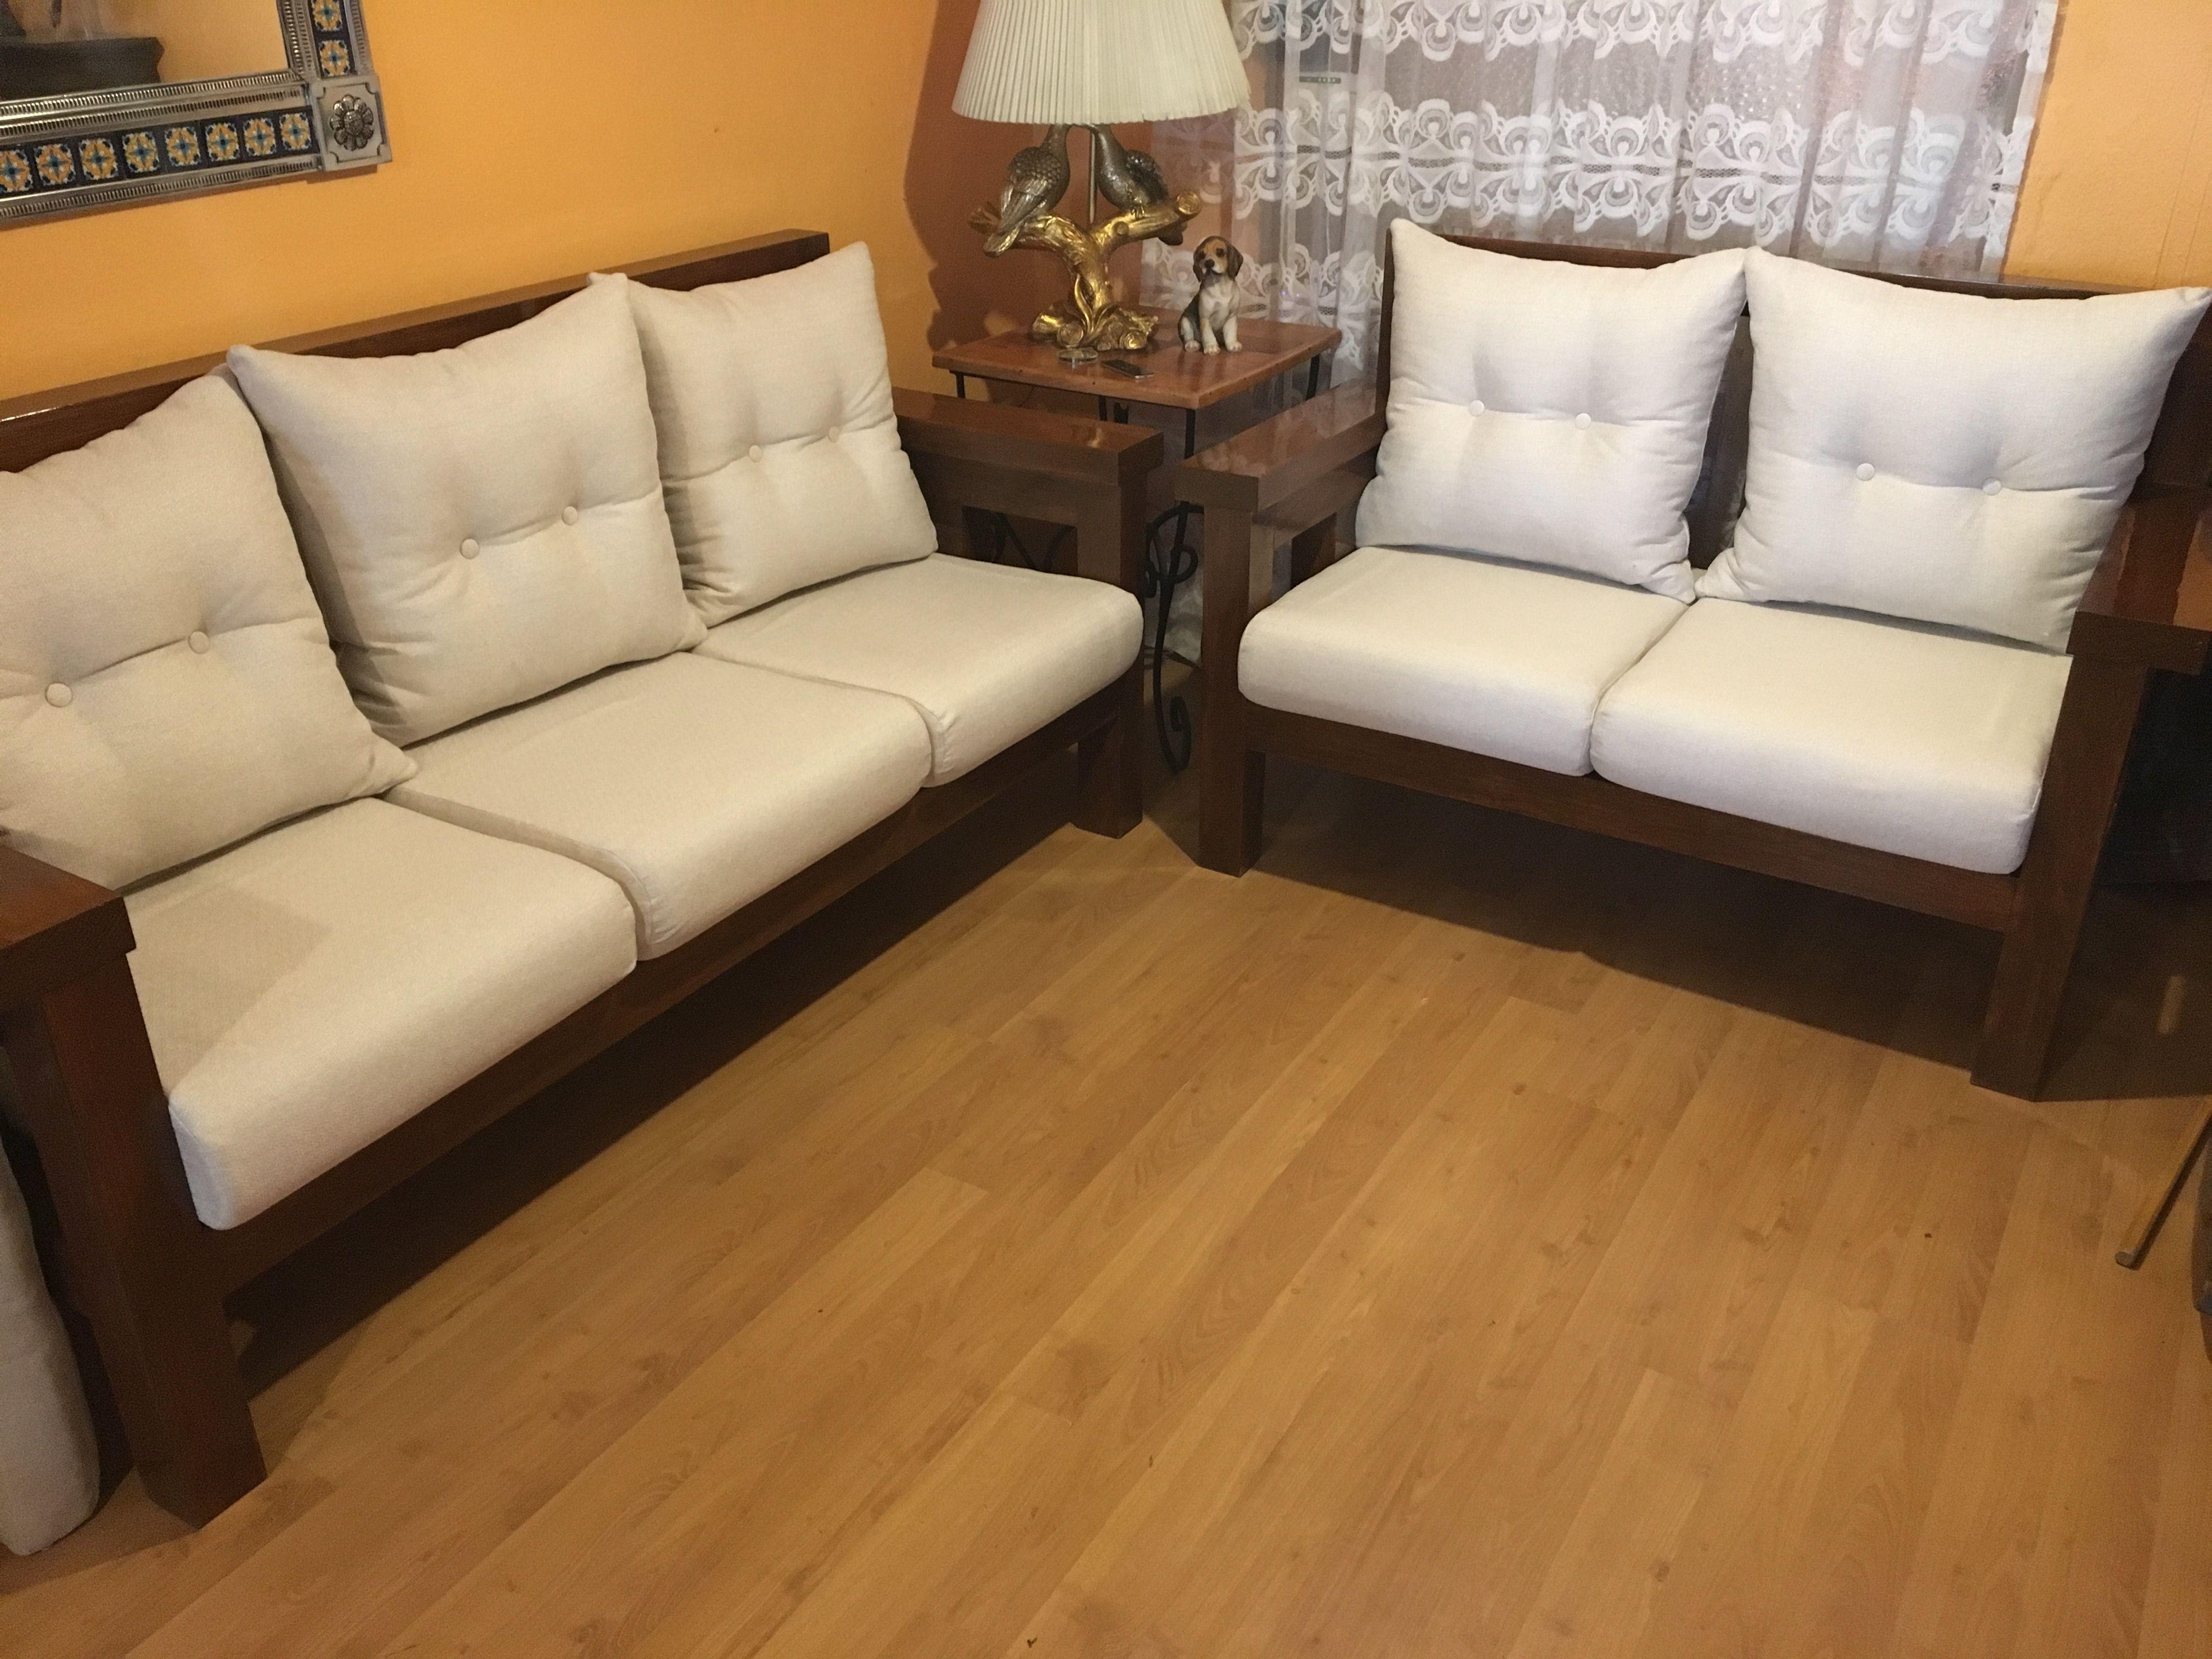 Muebles de madera para sala. Sofá de madera realizado sobre diseño ...